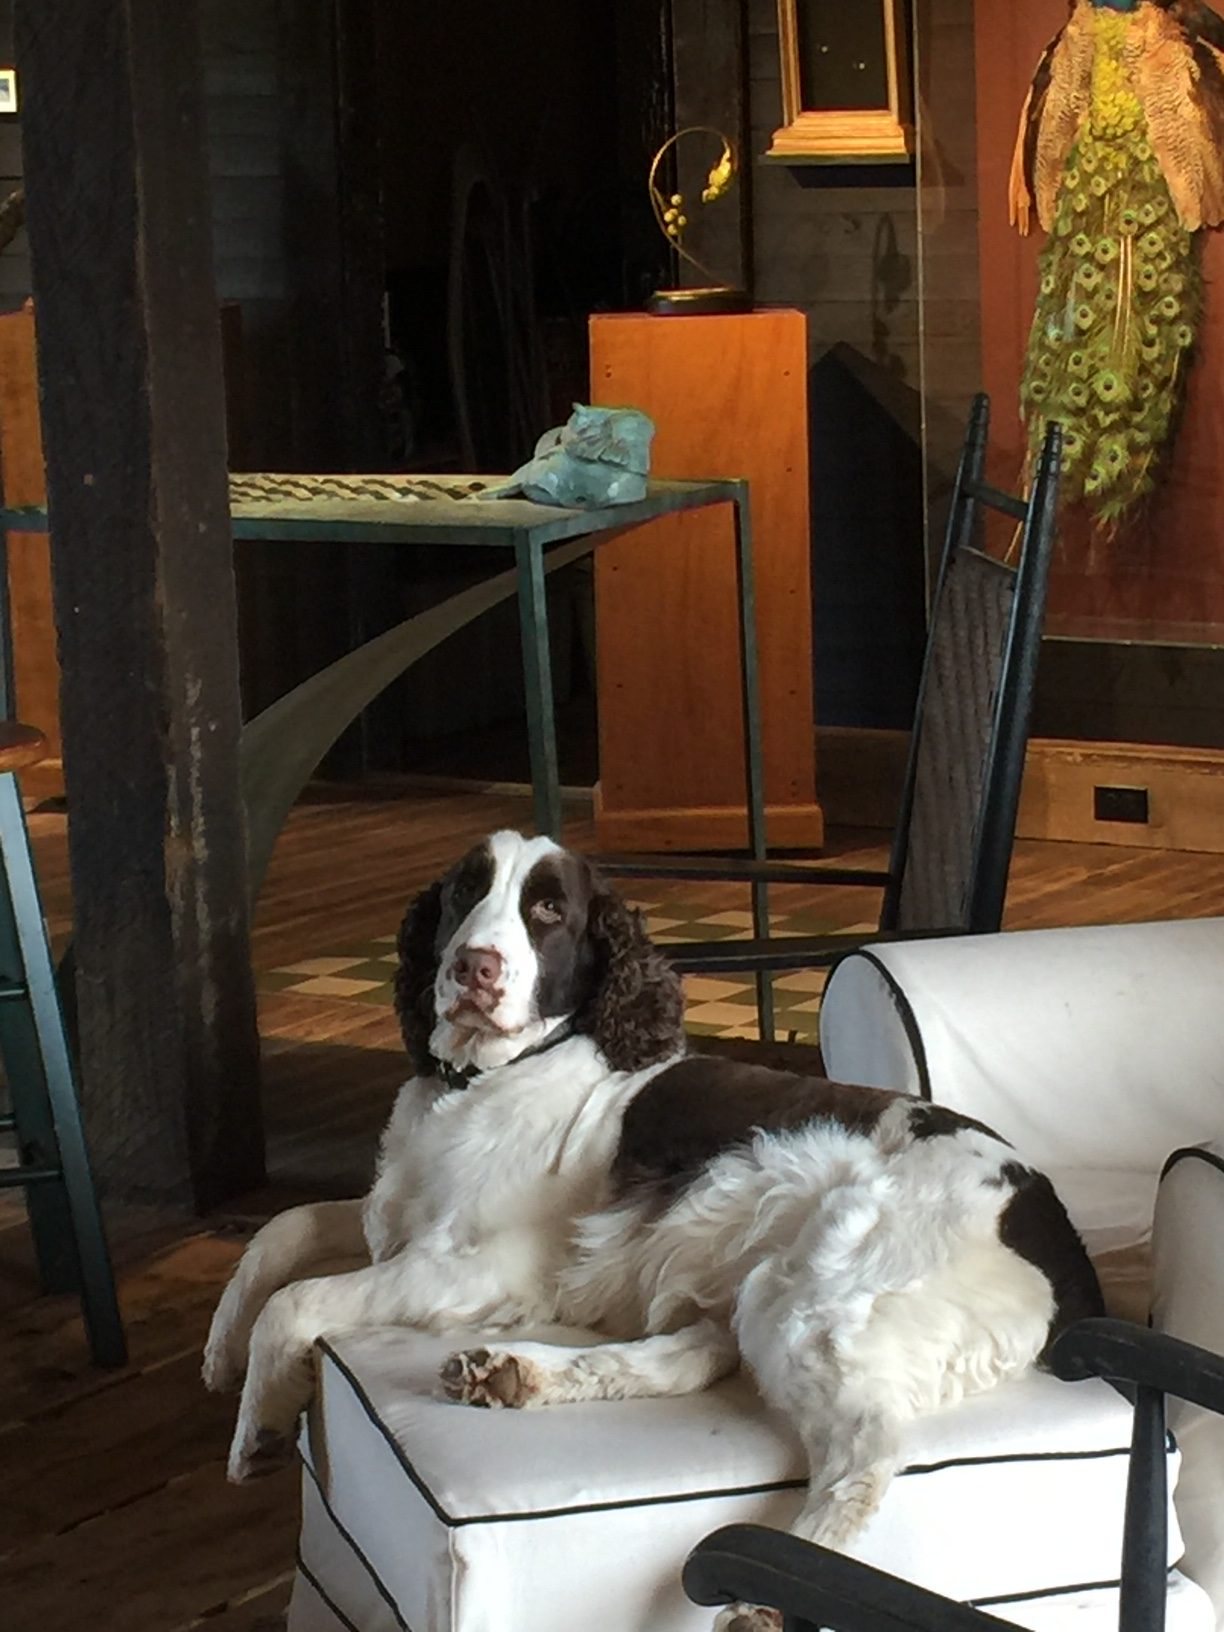 Diana's dog Cooper in the studio